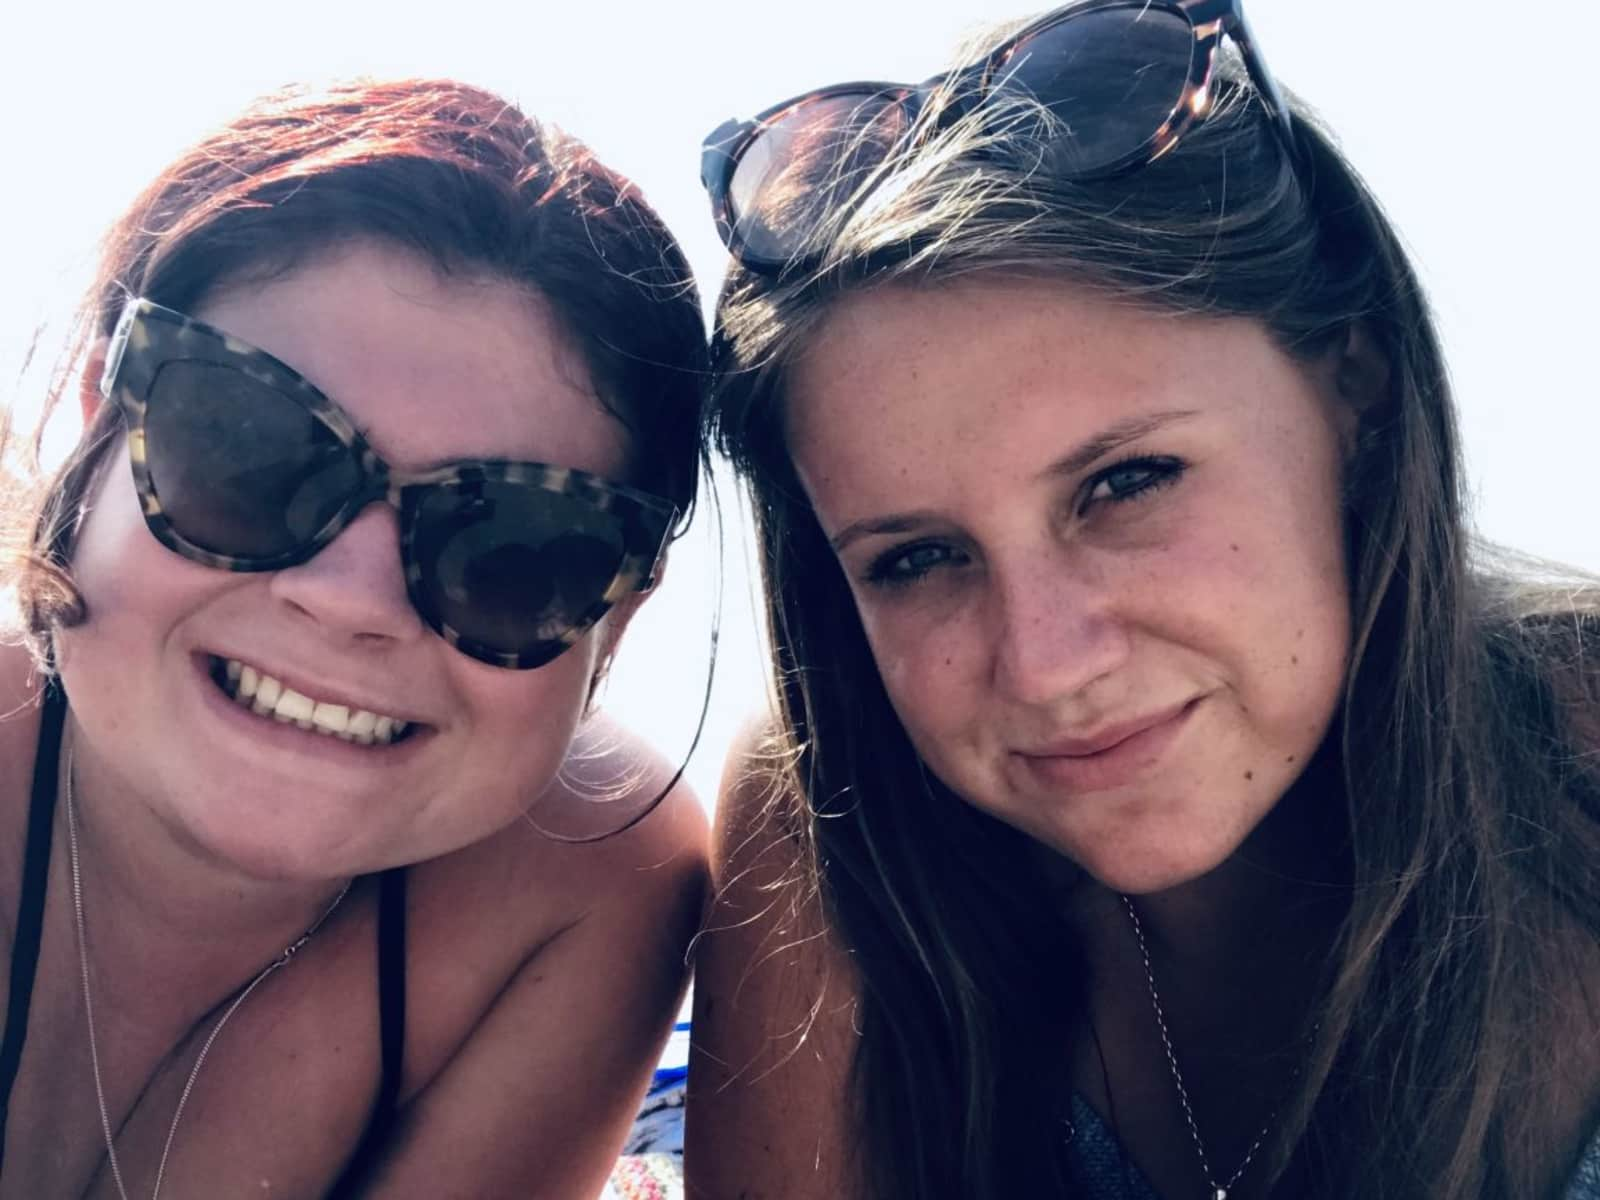 Abby & Kathleen-rose from Matakana, New Zealand